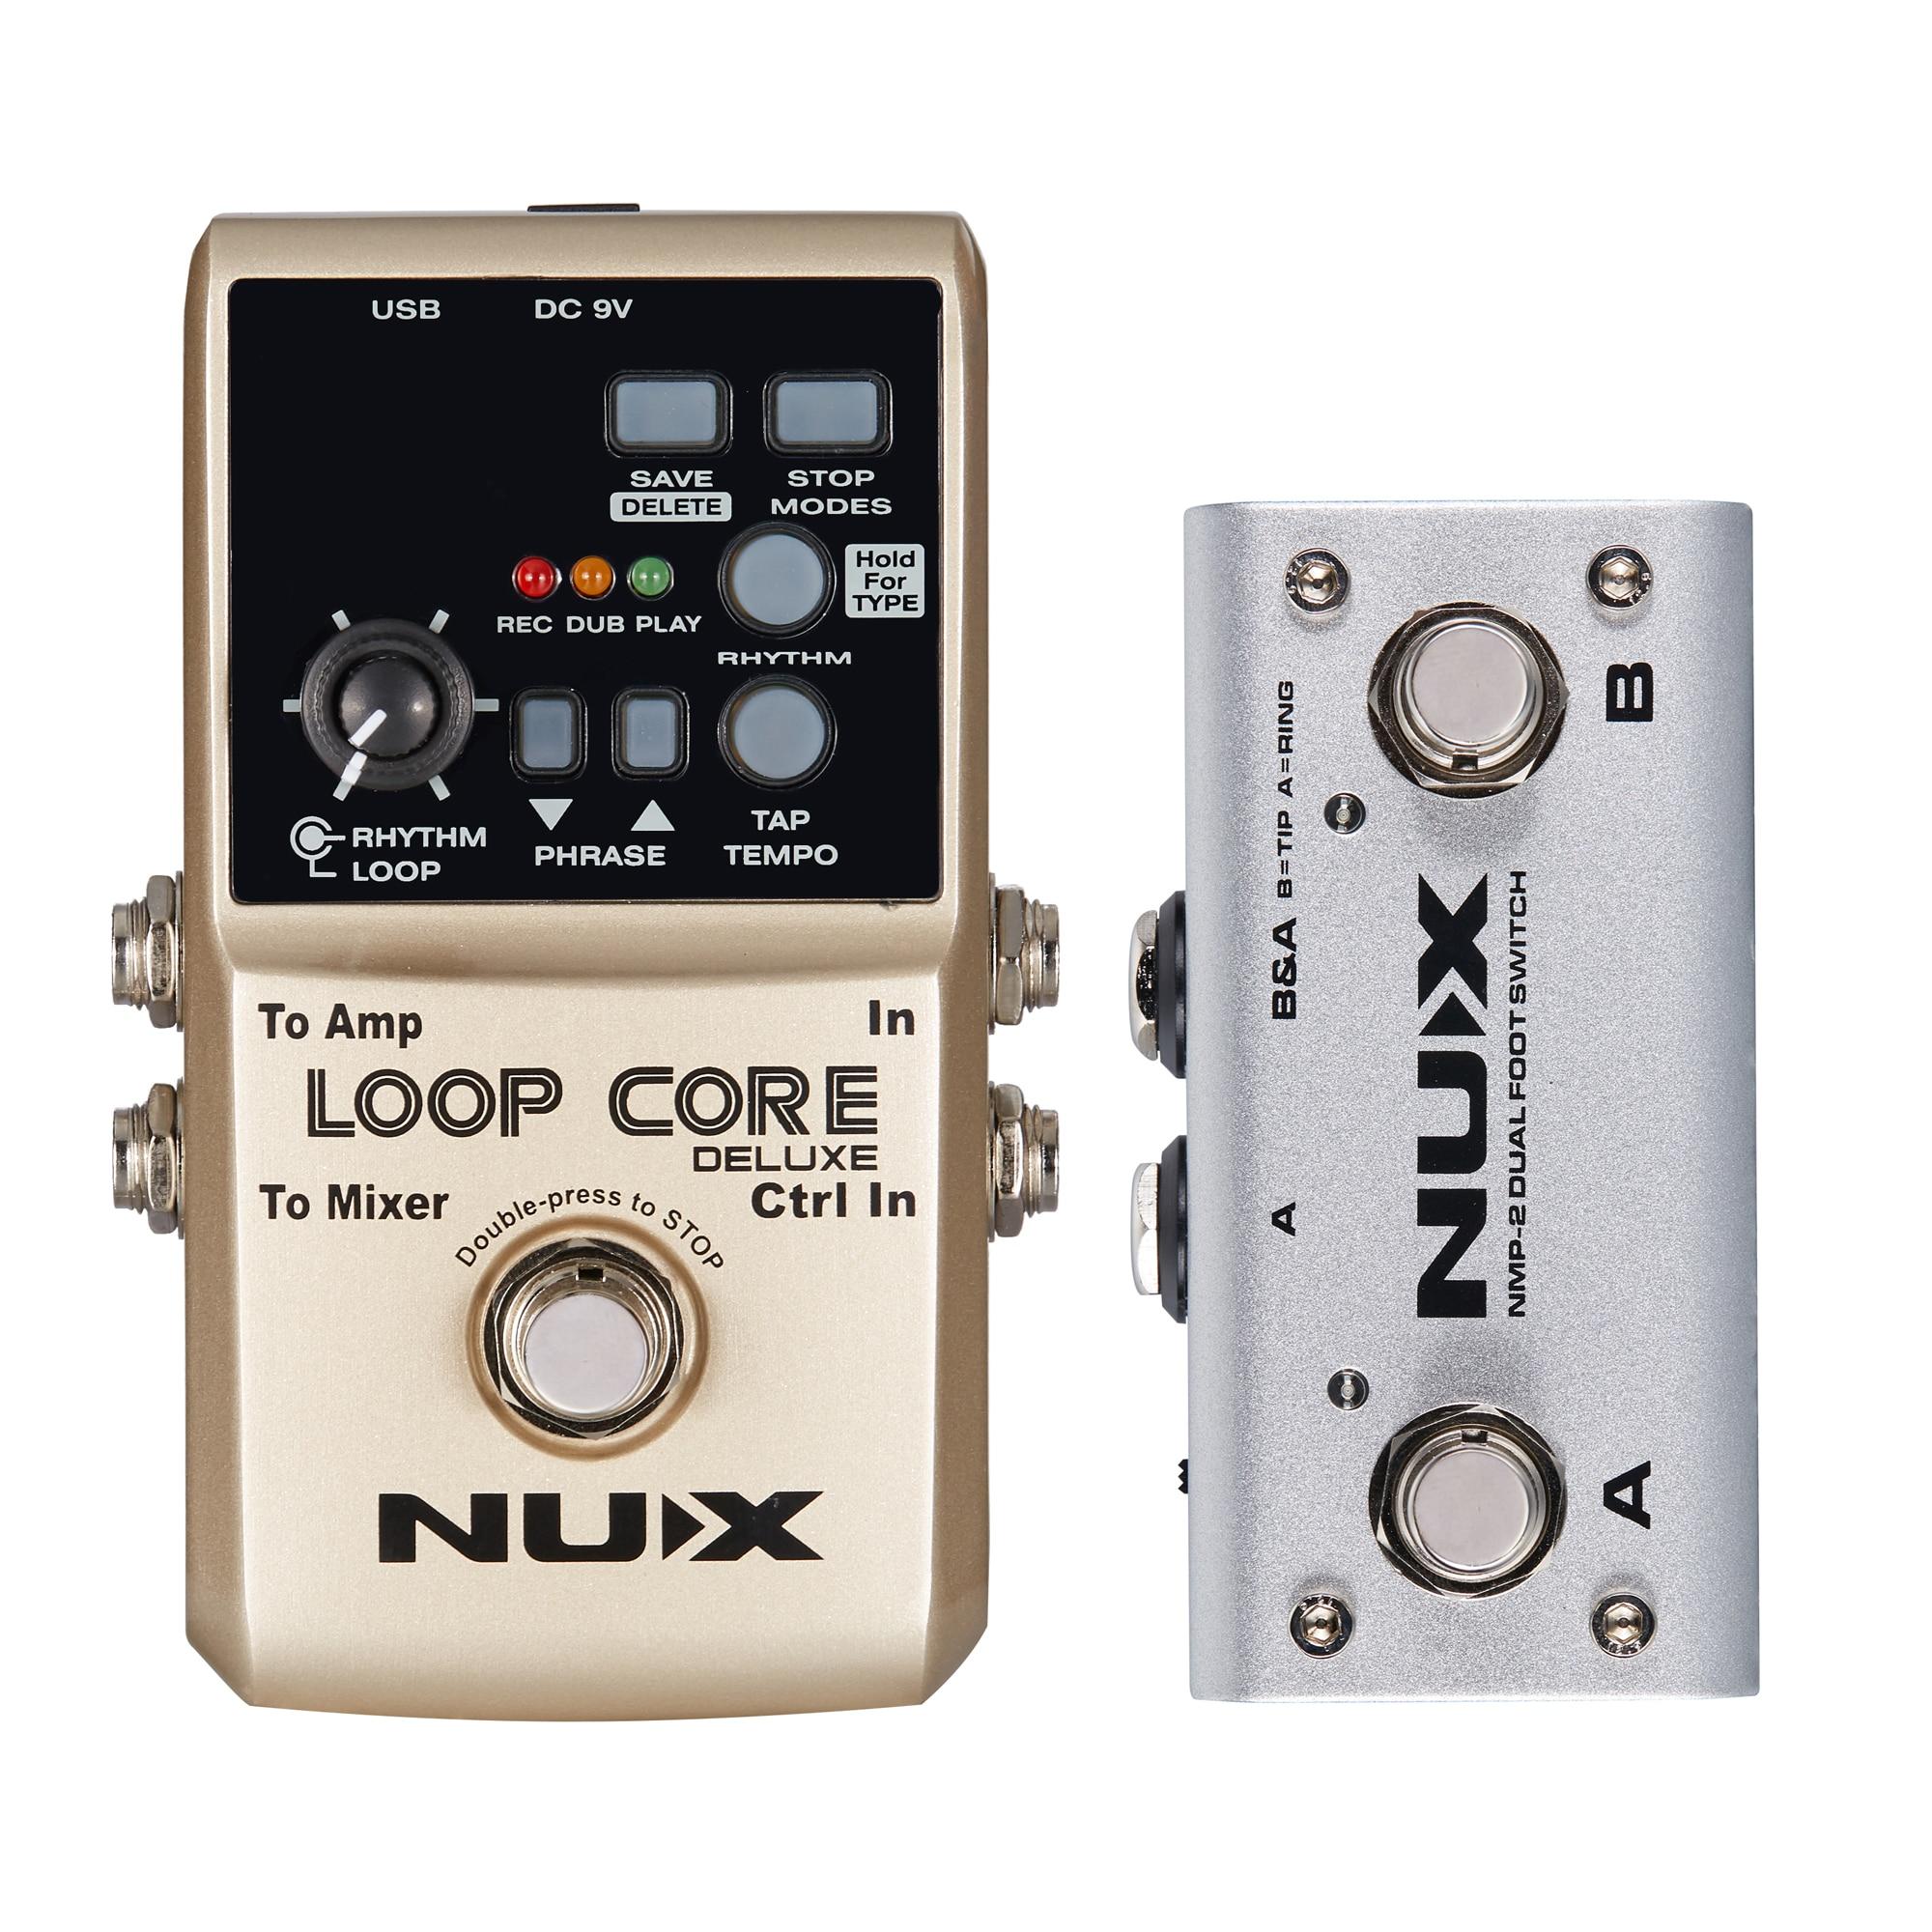 NUX Loop Core Deluxe Stompbox 24-bit Looper Pedal 8 Hours Recording Time Built-in 40 Drum Rhythms Electric Guitar Accessories